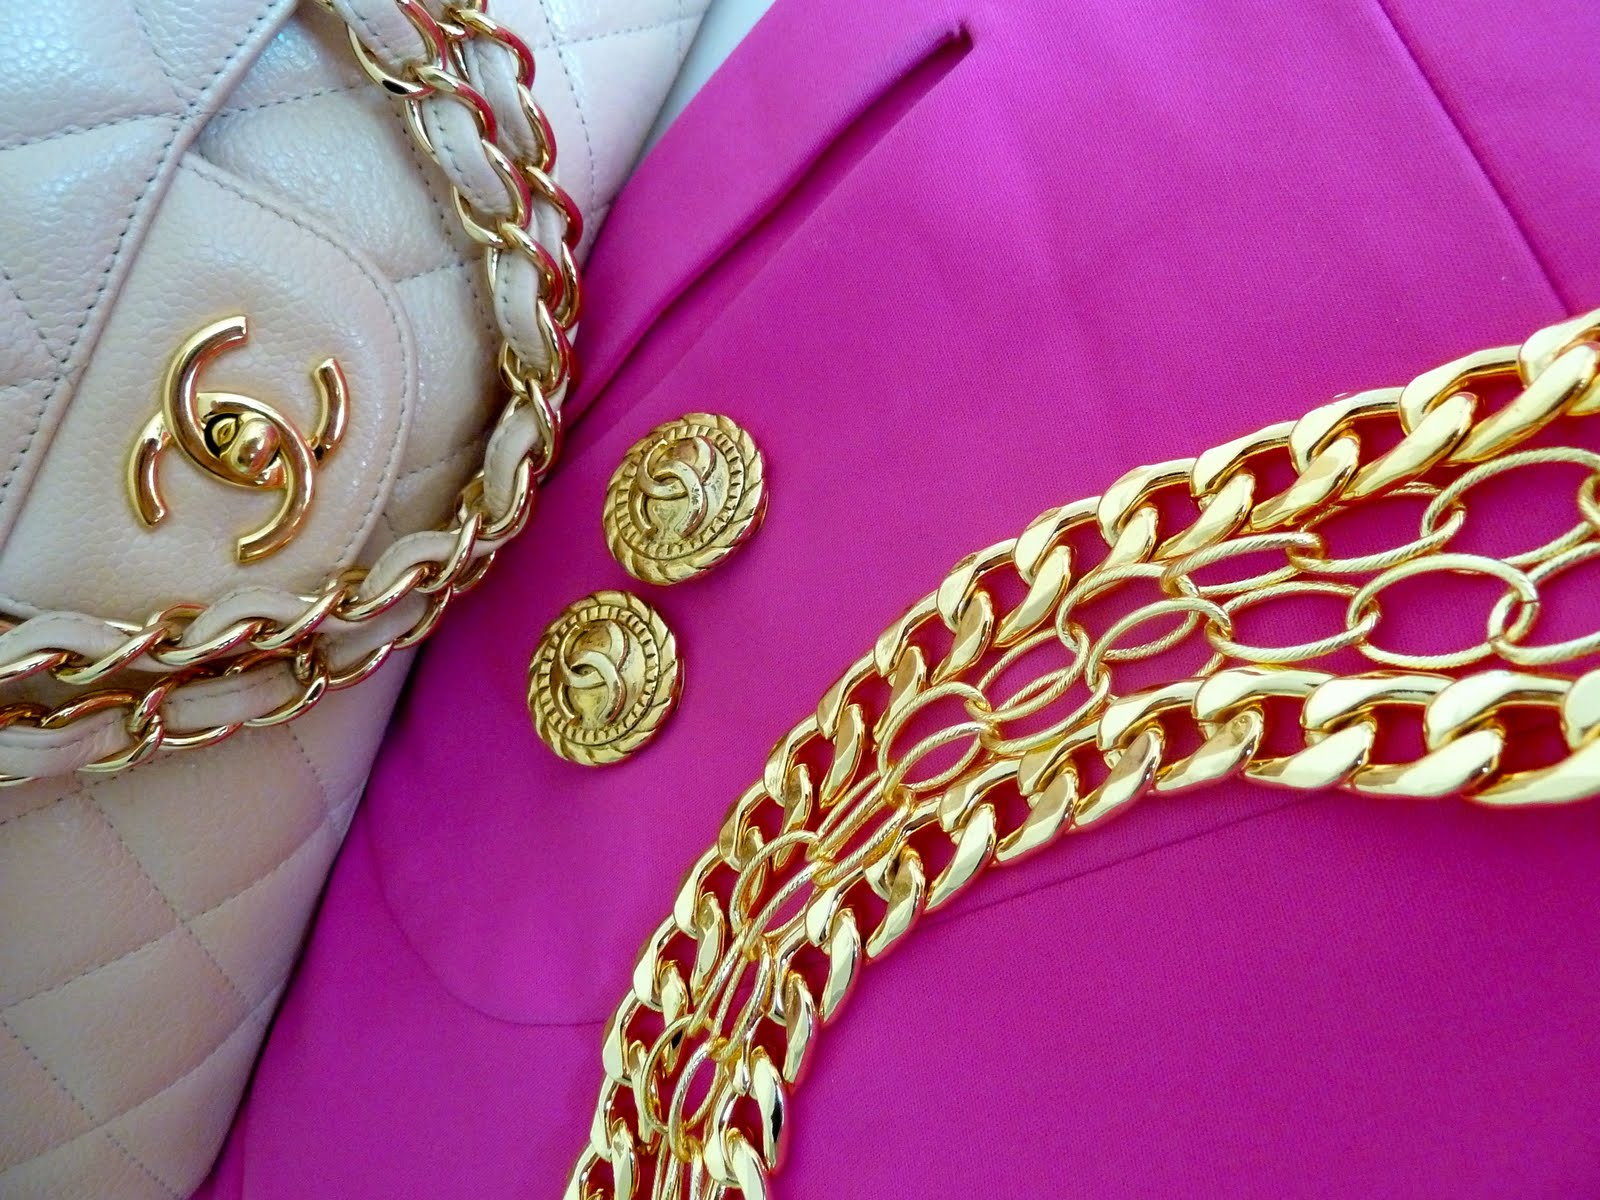 Vintage Chanel Backgrounds Vintage chanel earrings